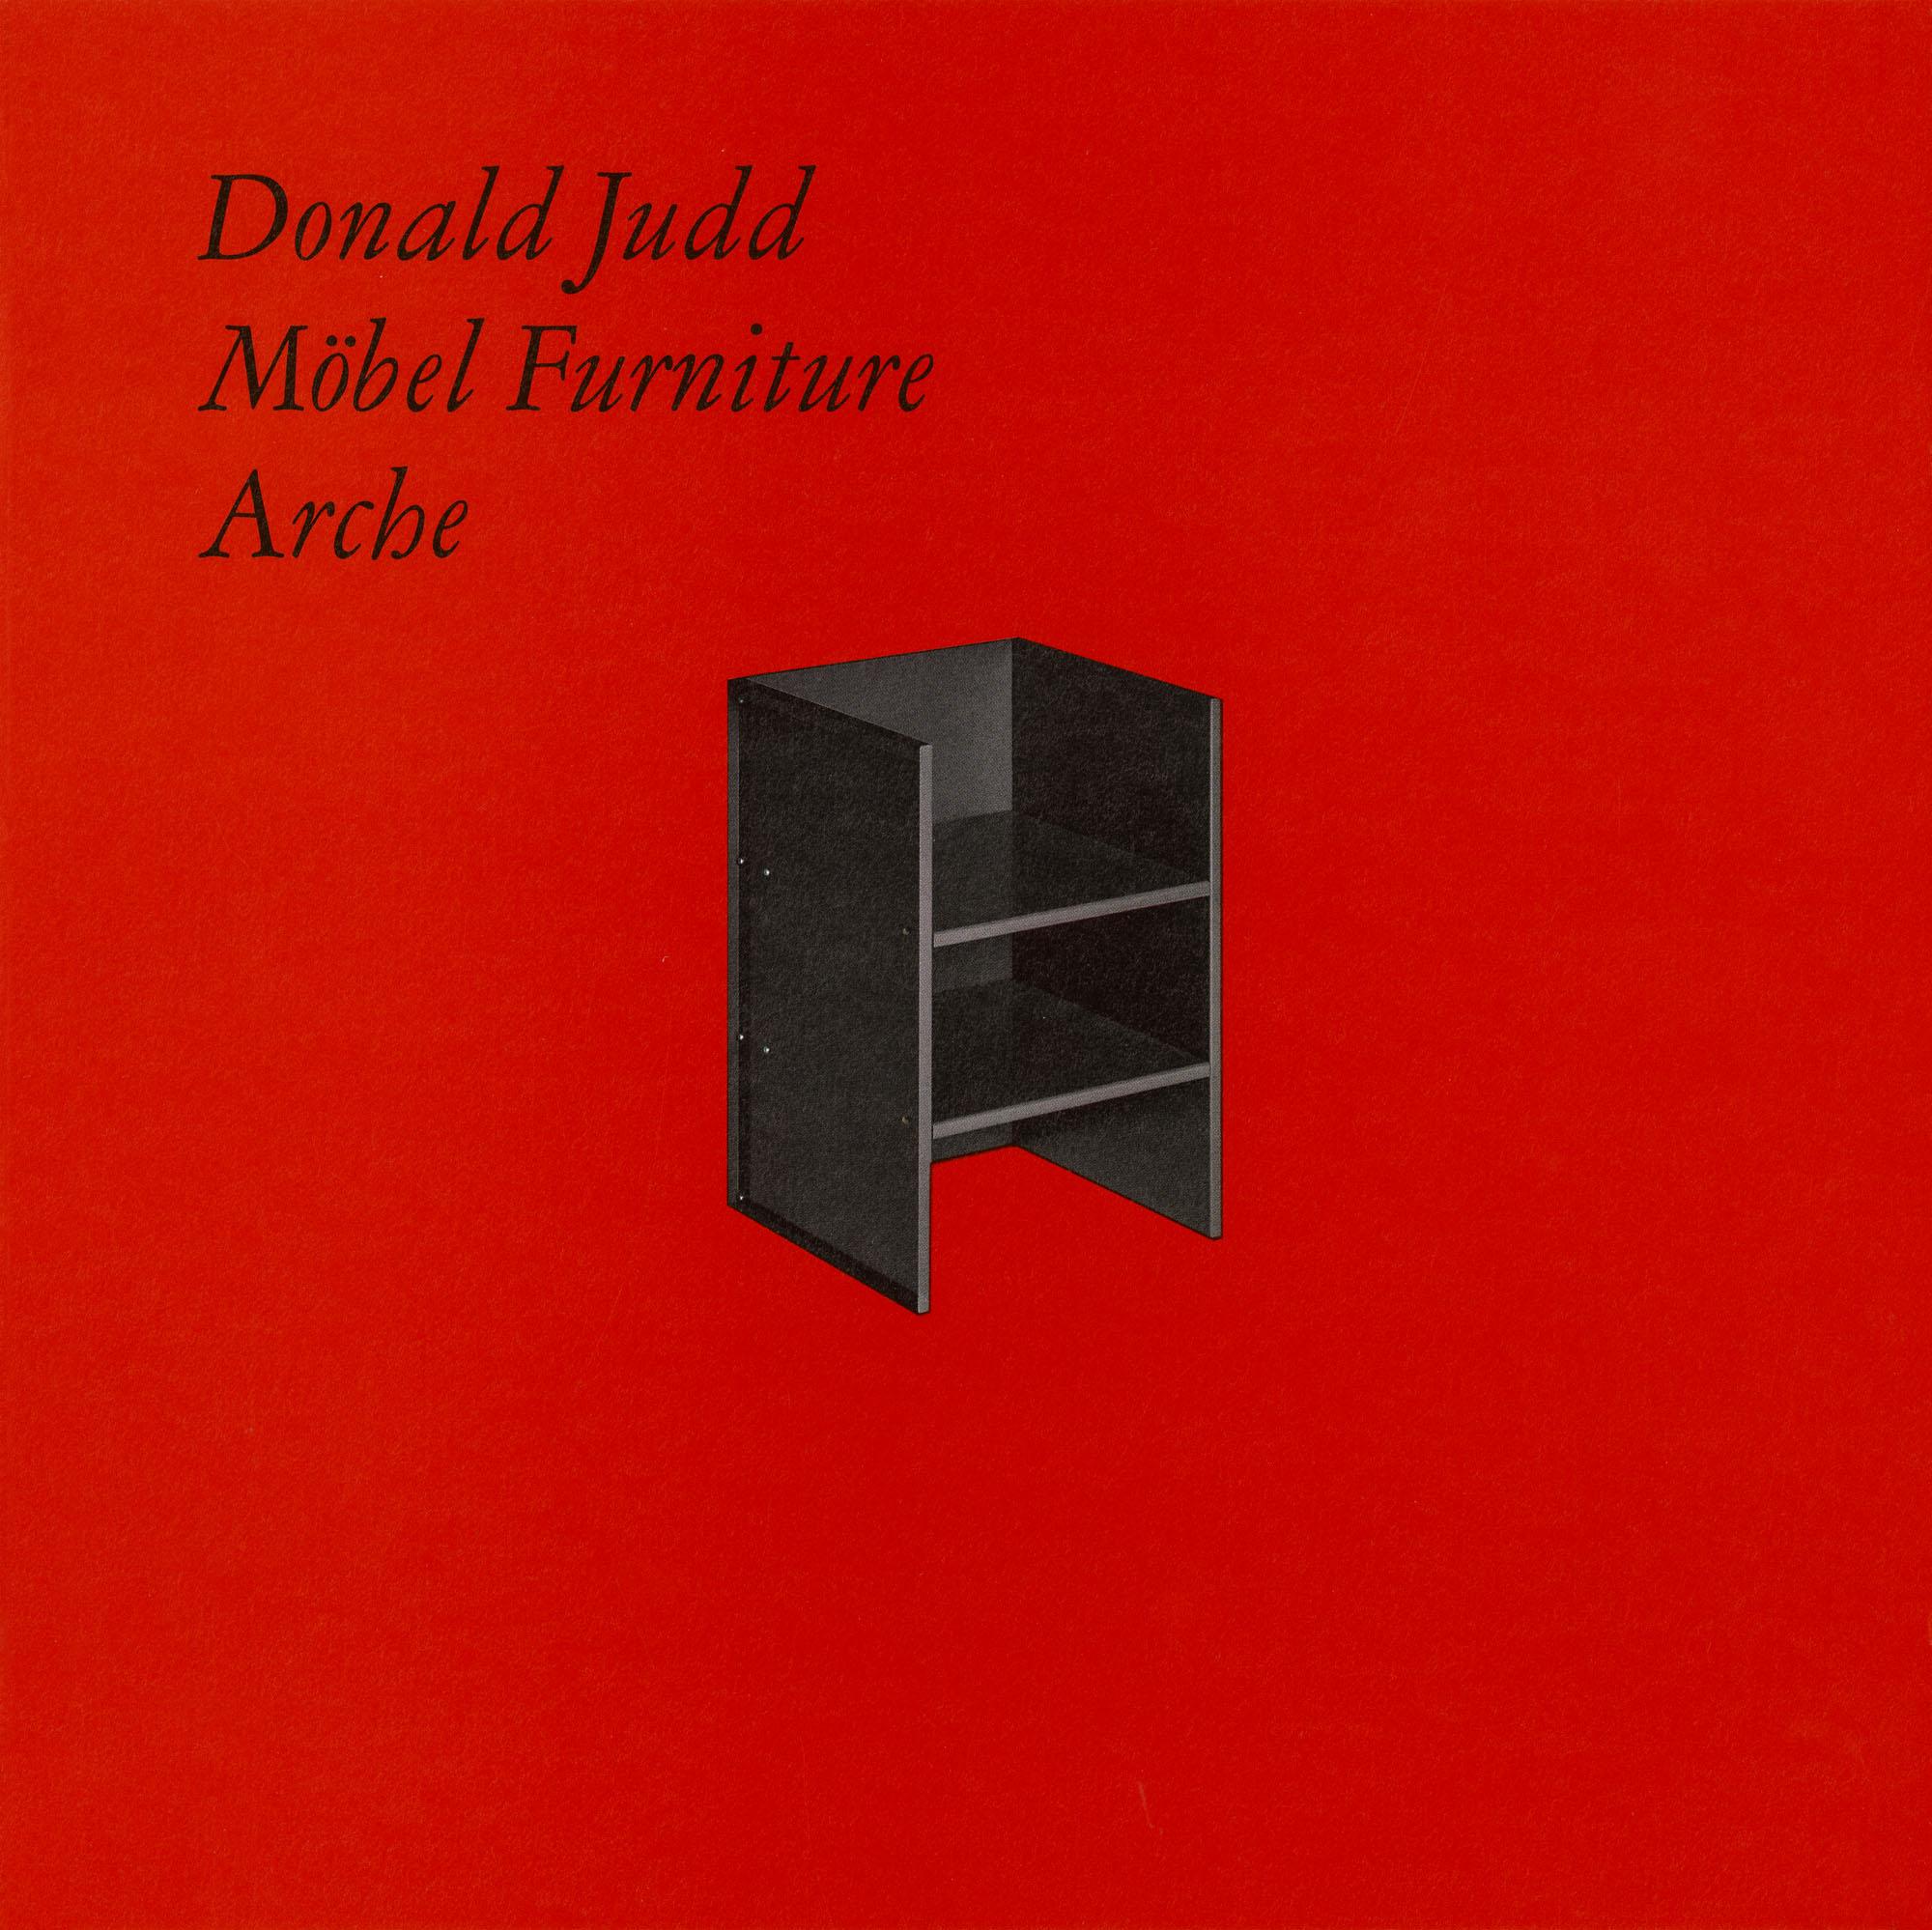 No. 15 Donald Judd Stuhl